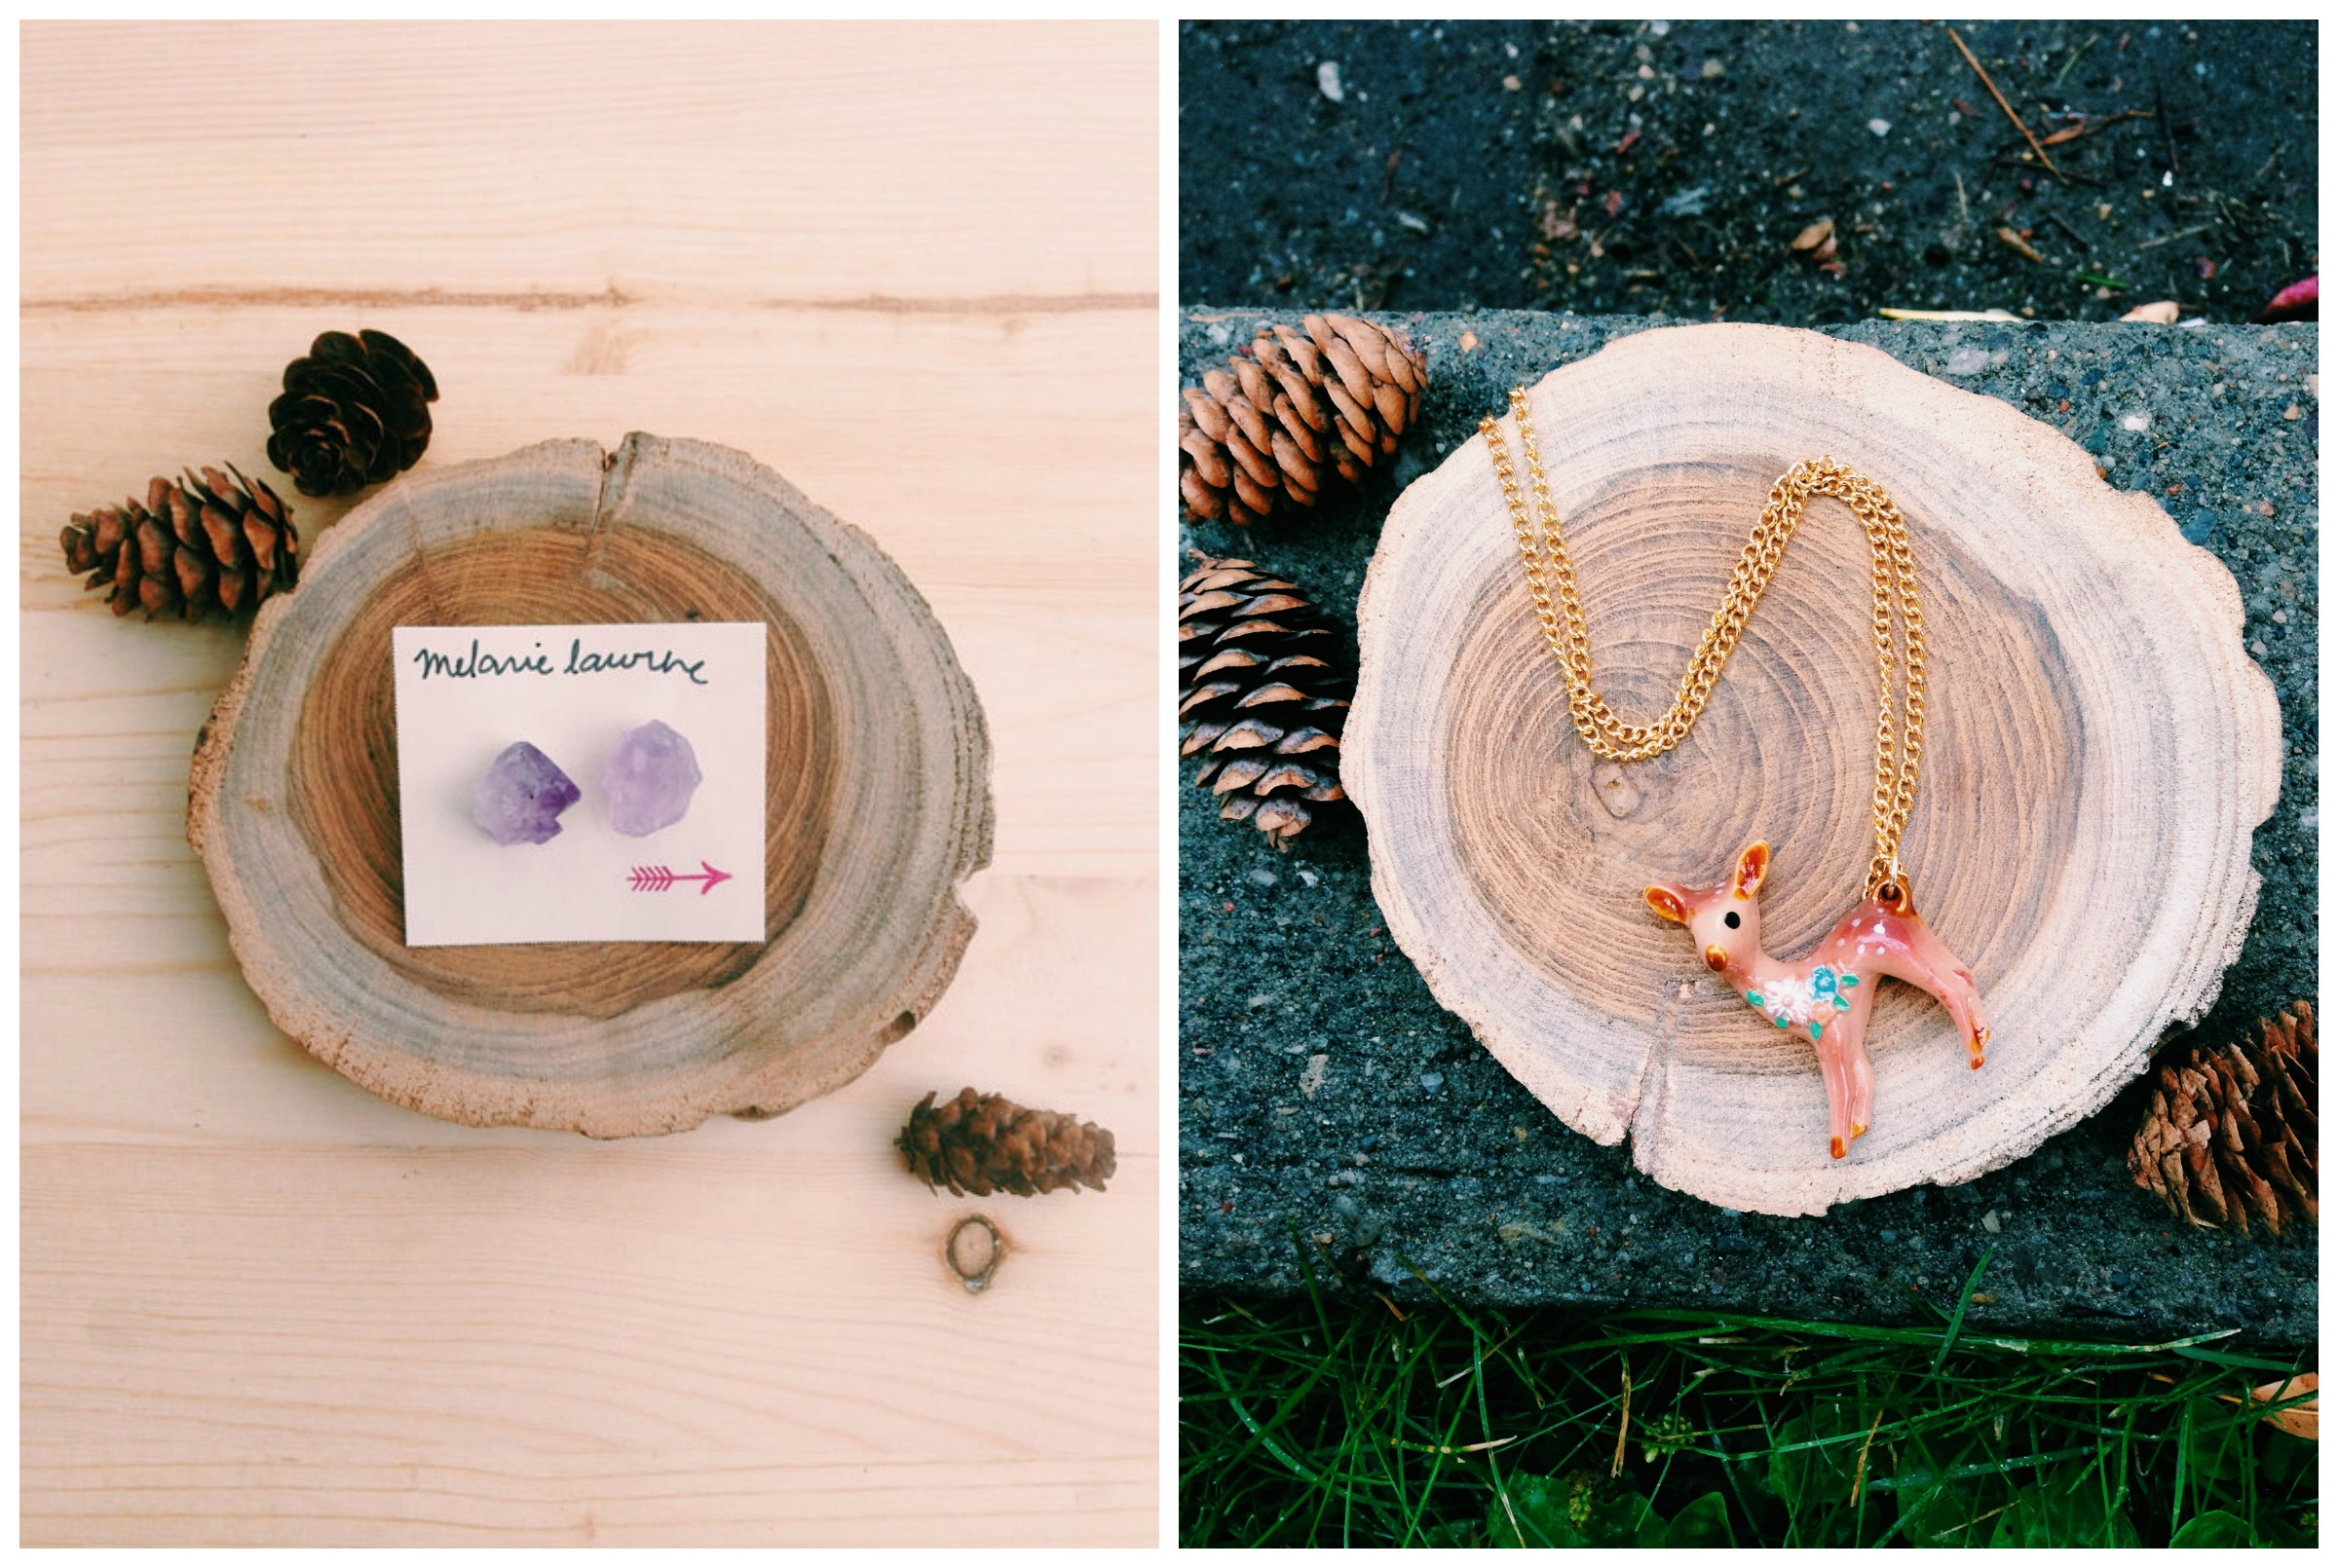 Jewellery by MelanieLaurene